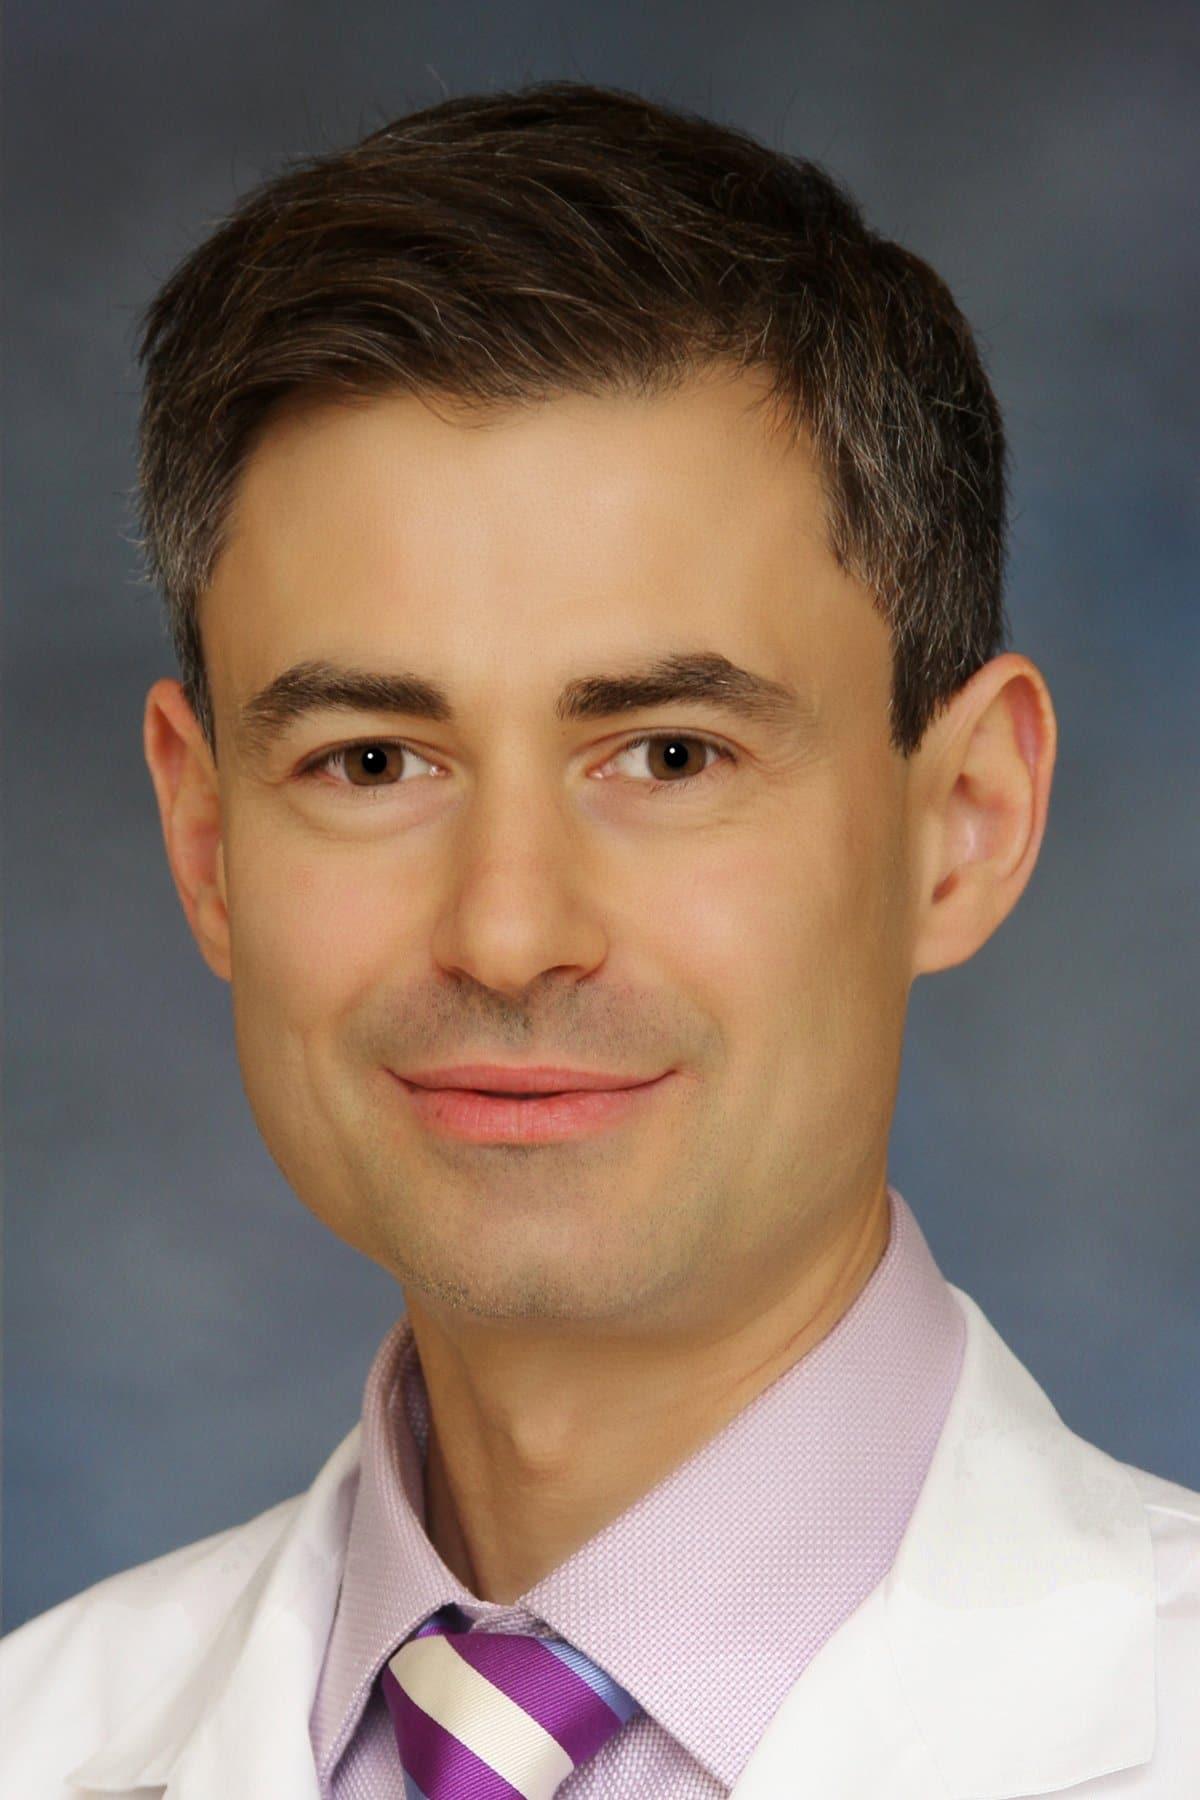 Ilya Rozenbaum MD Ophthalmologist Cataract Surgeon & Glaucoma Specialist